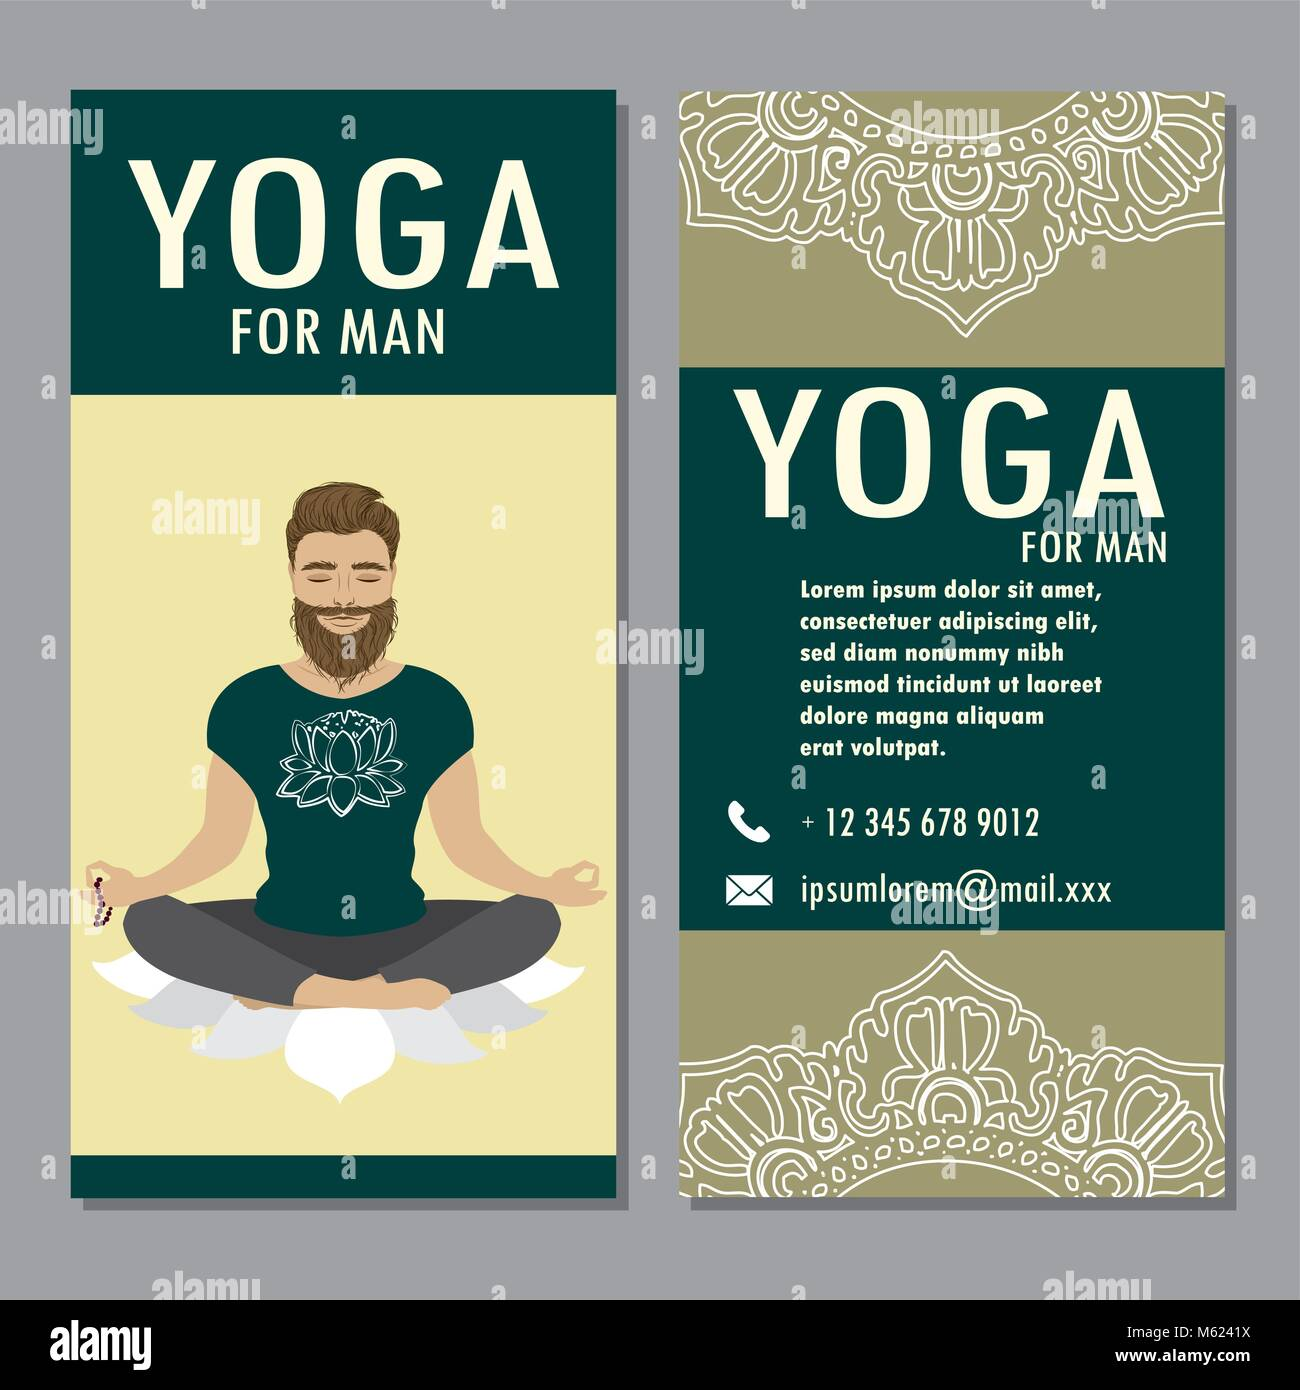 Yoga Banner Template Stock Photos & Yoga Banner Template Stock ...